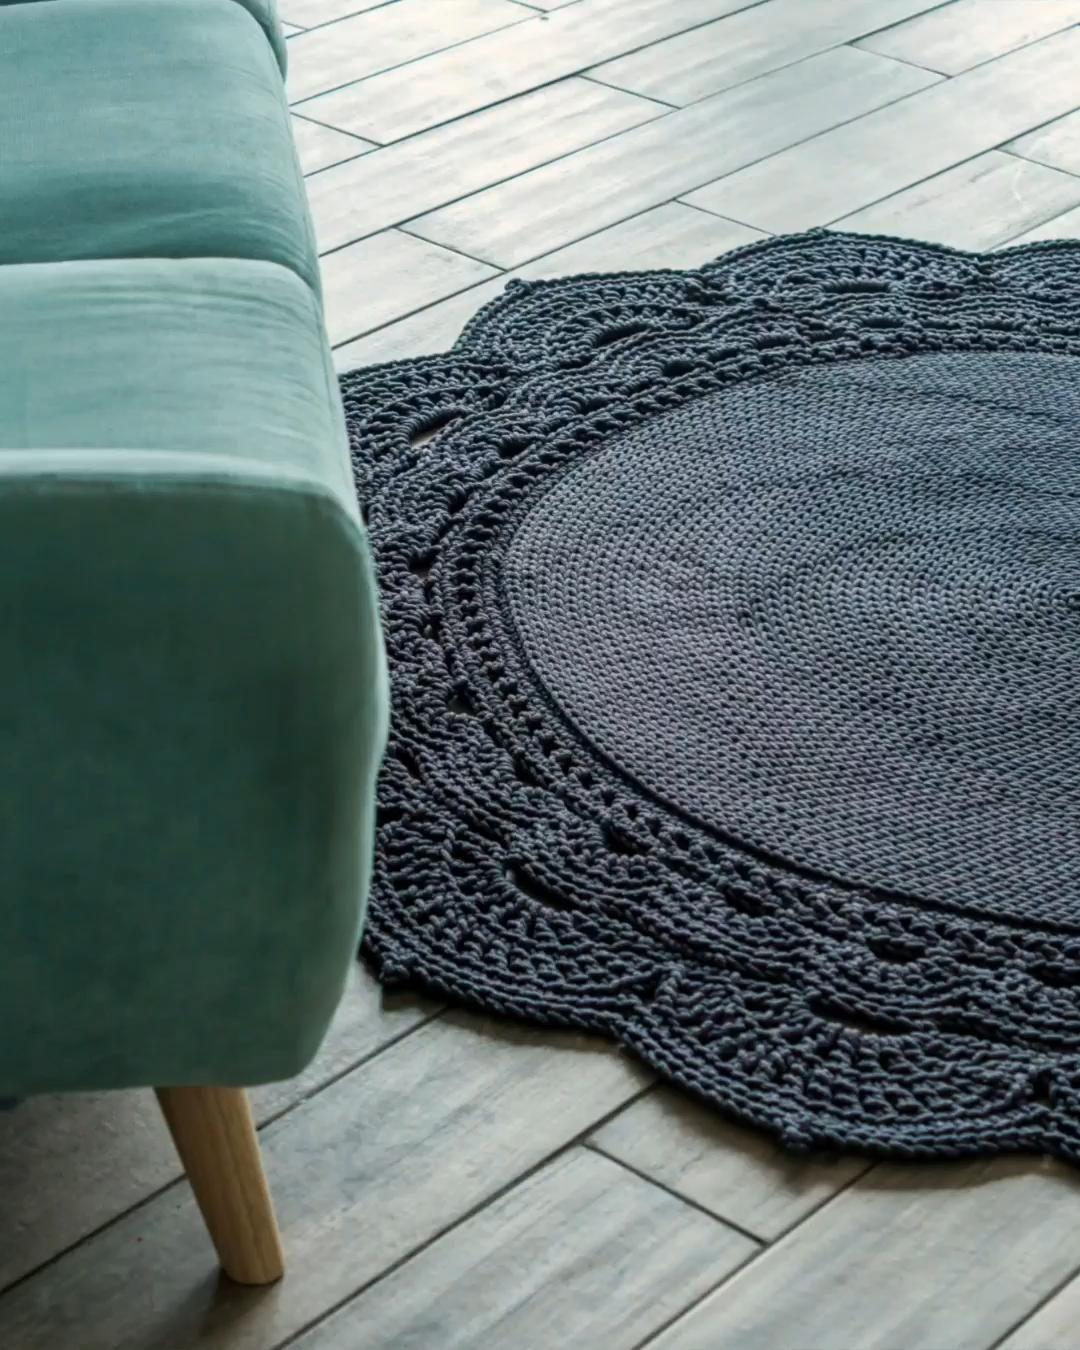 Crochet rug pattern. Craft decor